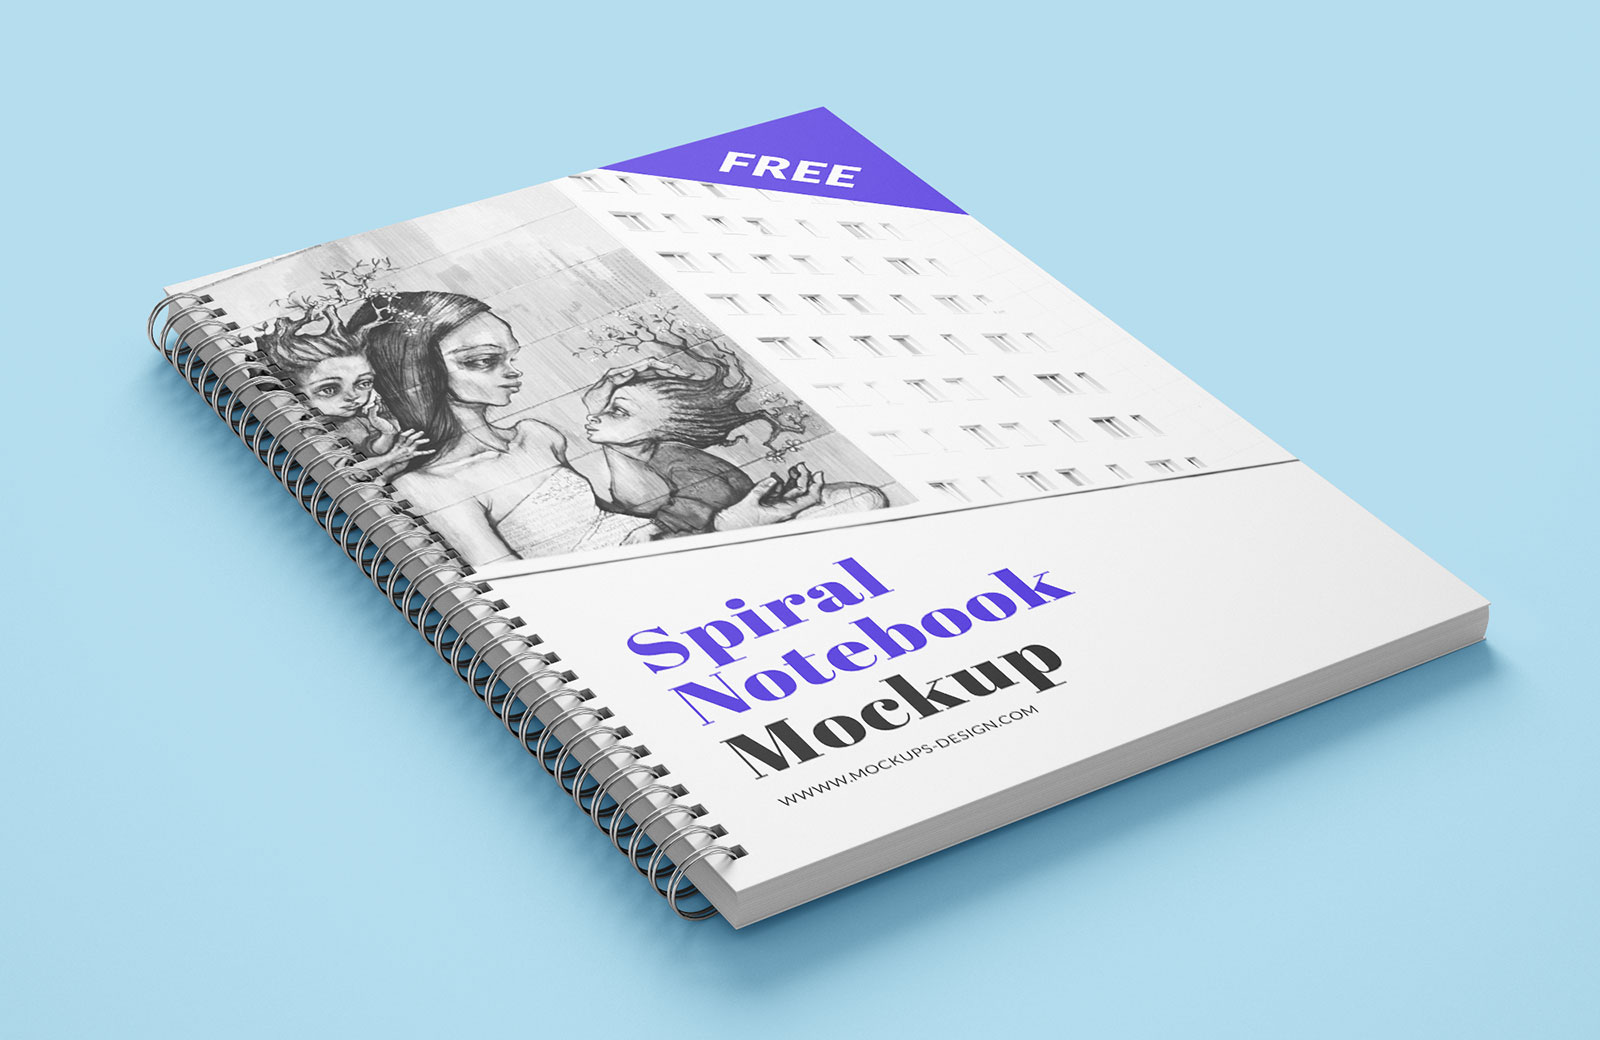 Free Spiral Notebook Mockup PSD (1)